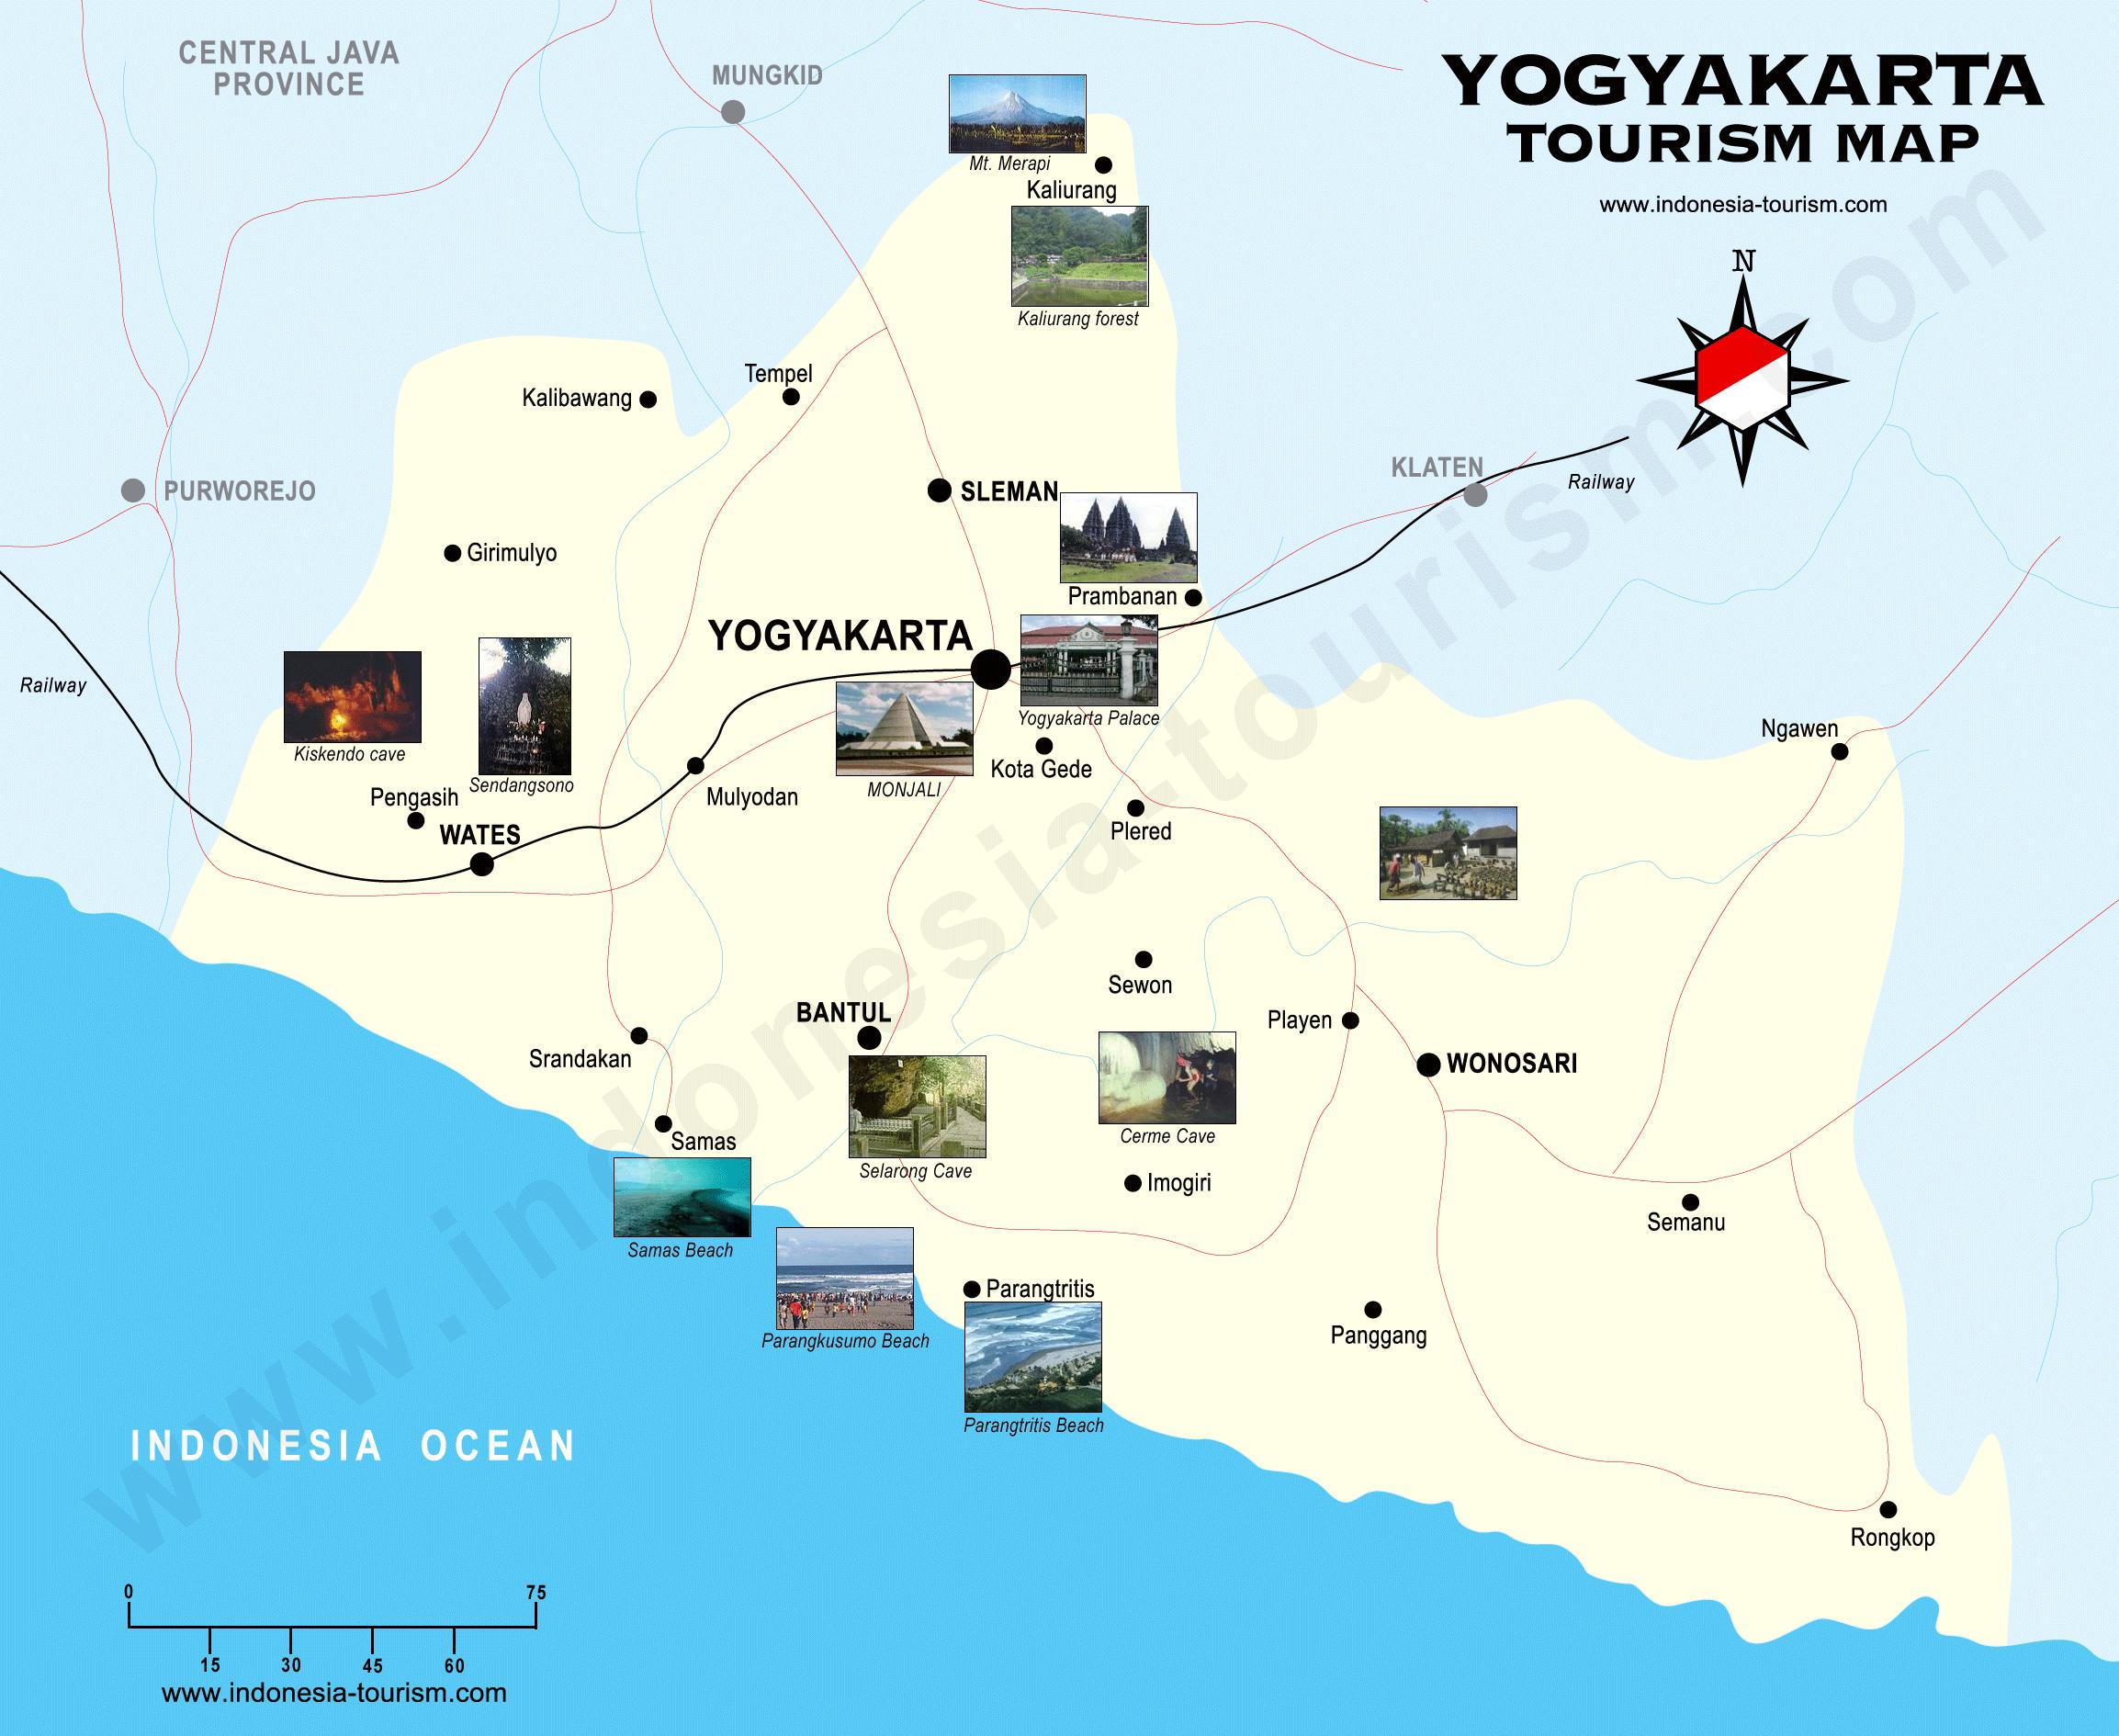 Yogyakarta ; centre culturel majeur de l'Indonésie 1